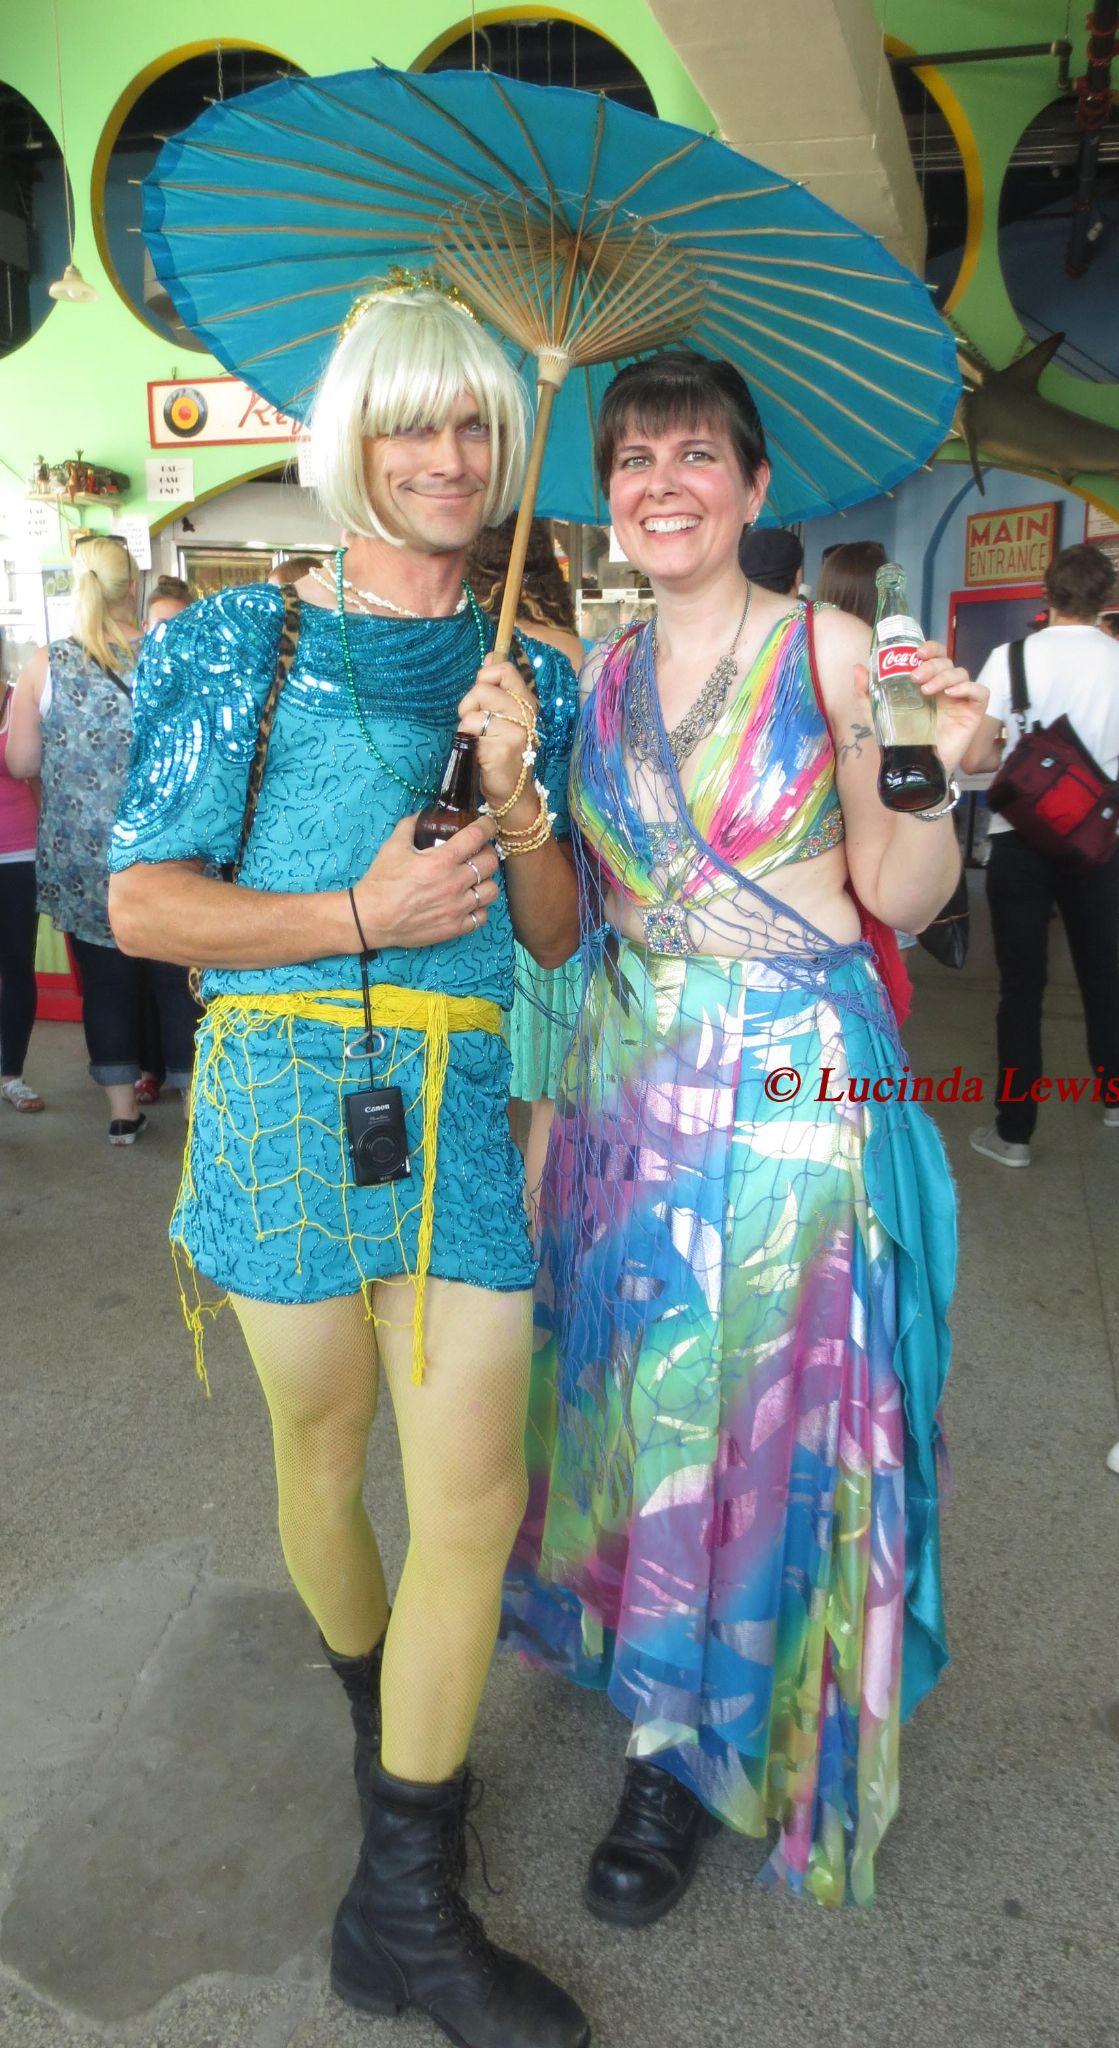 Mermaid Parade at Coney Island 21 June 2014 by LucindaLewis